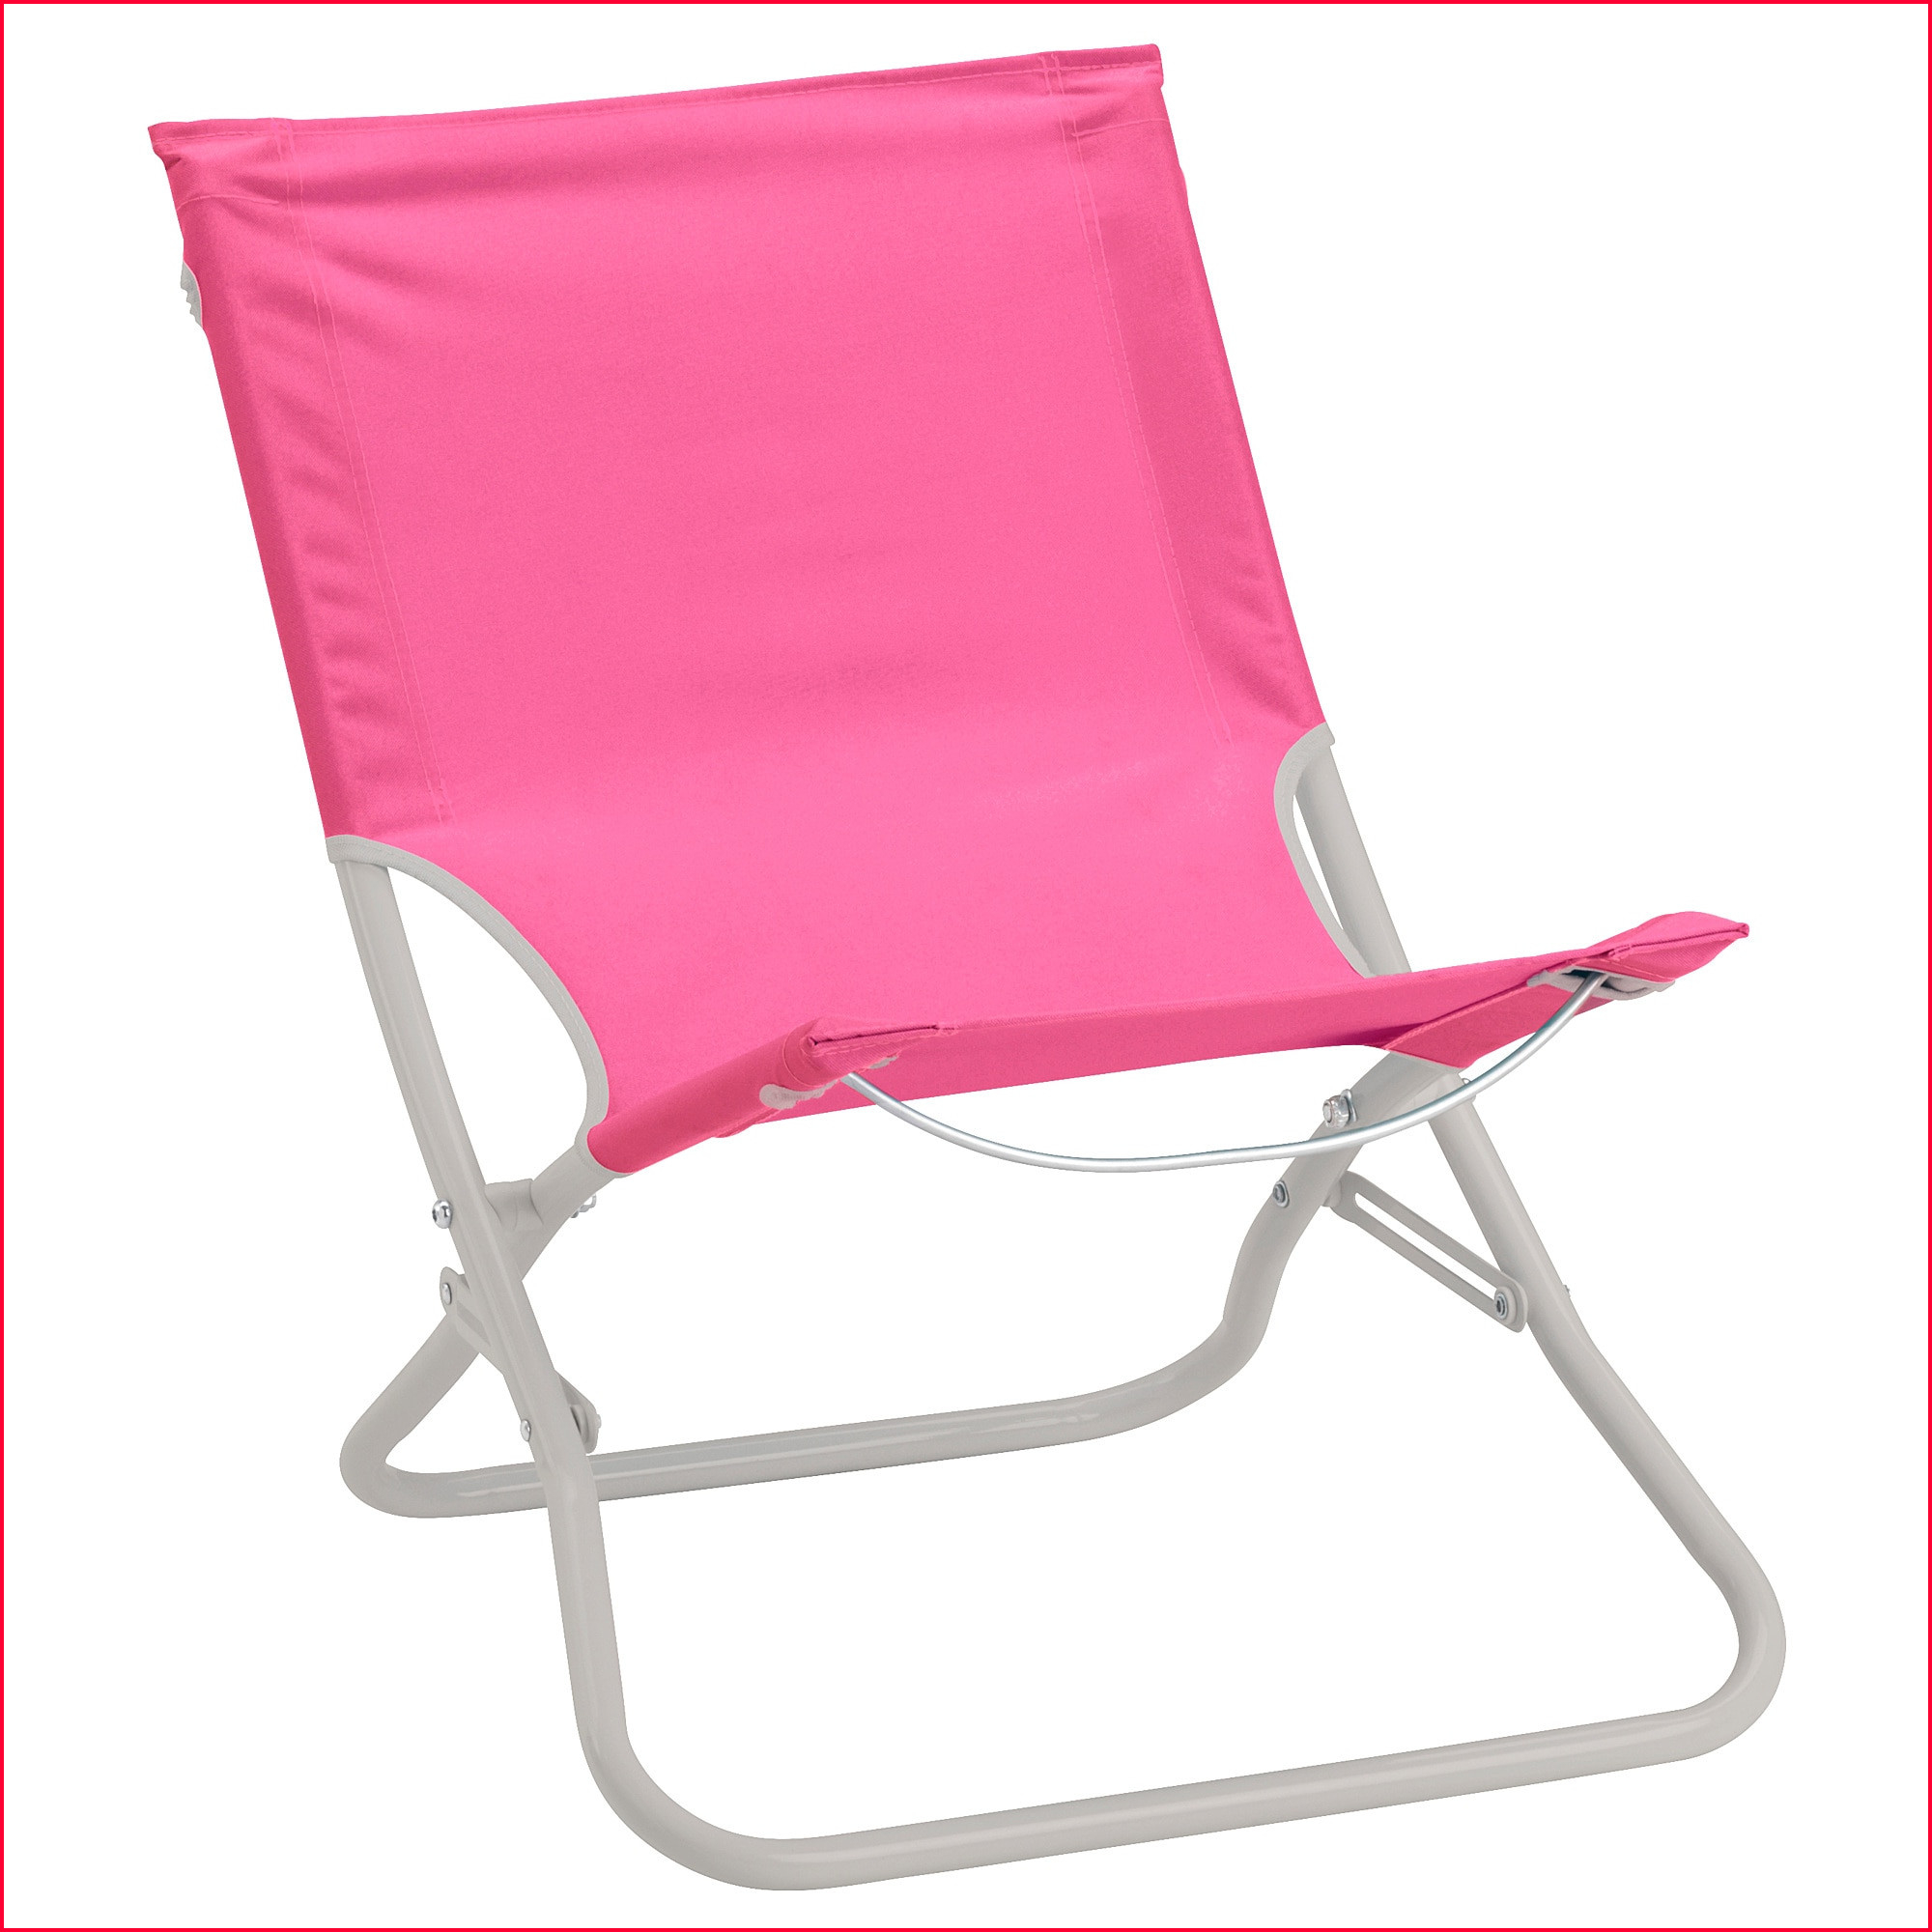 Sillas Playa Ikea Tldn Silla Playa Plegable H M Silla De Playa Rosa Ikea